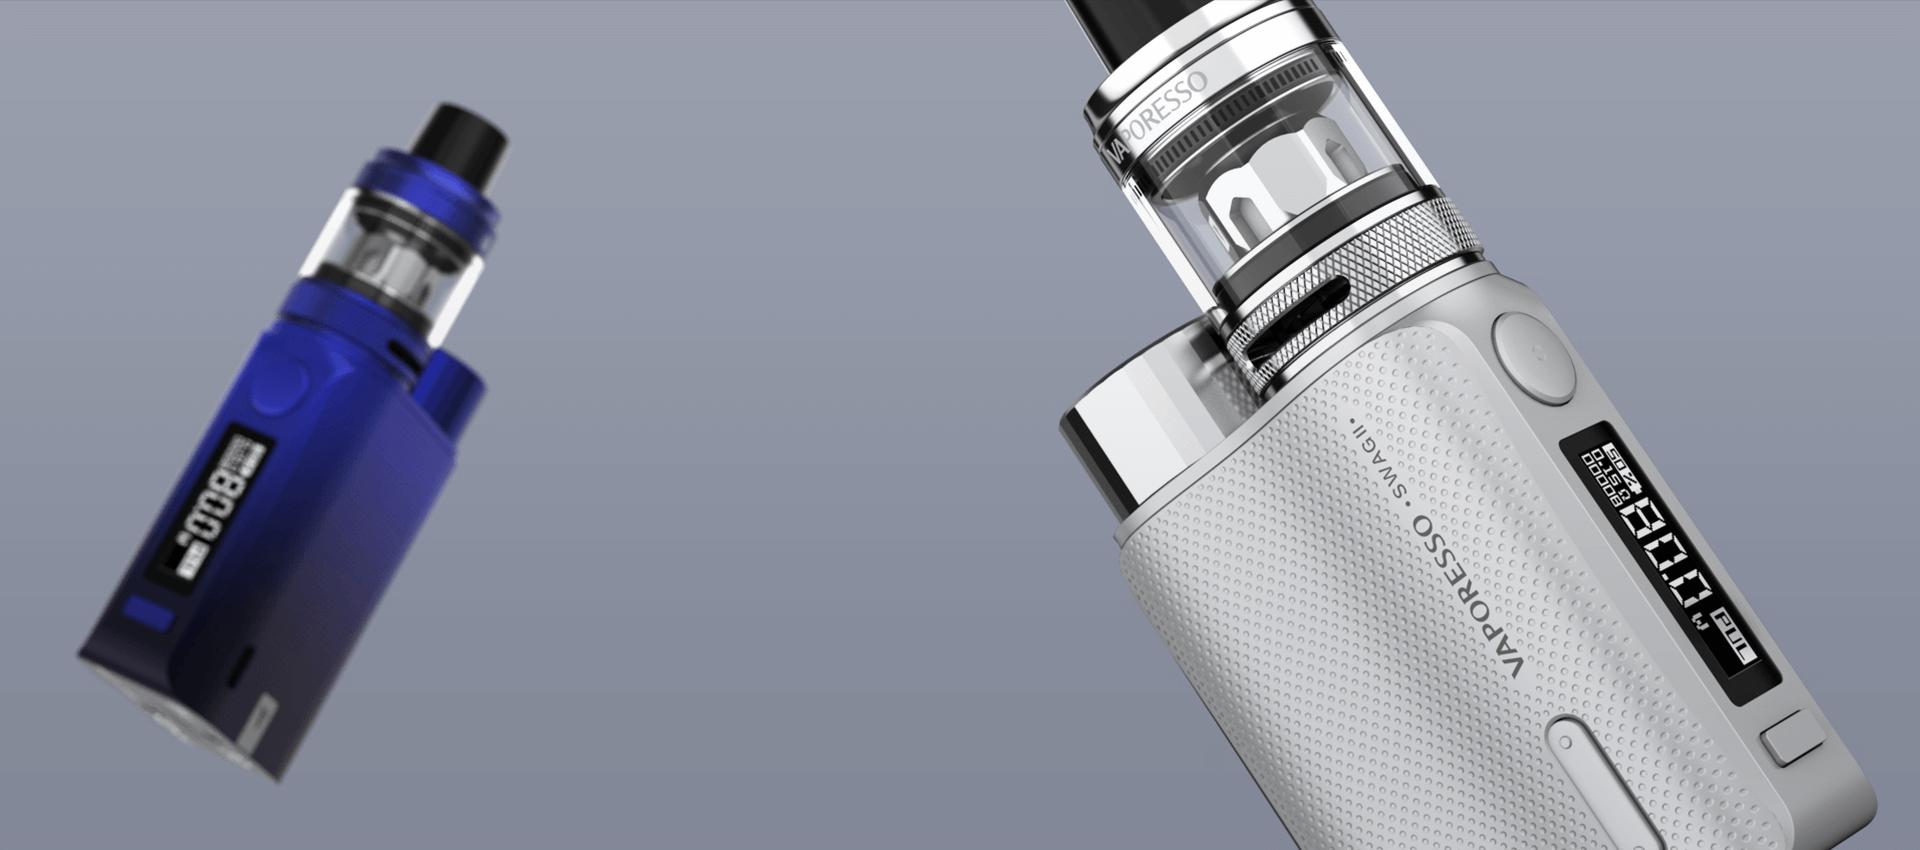 Vaporesso Swag 2 Kit ergonomic